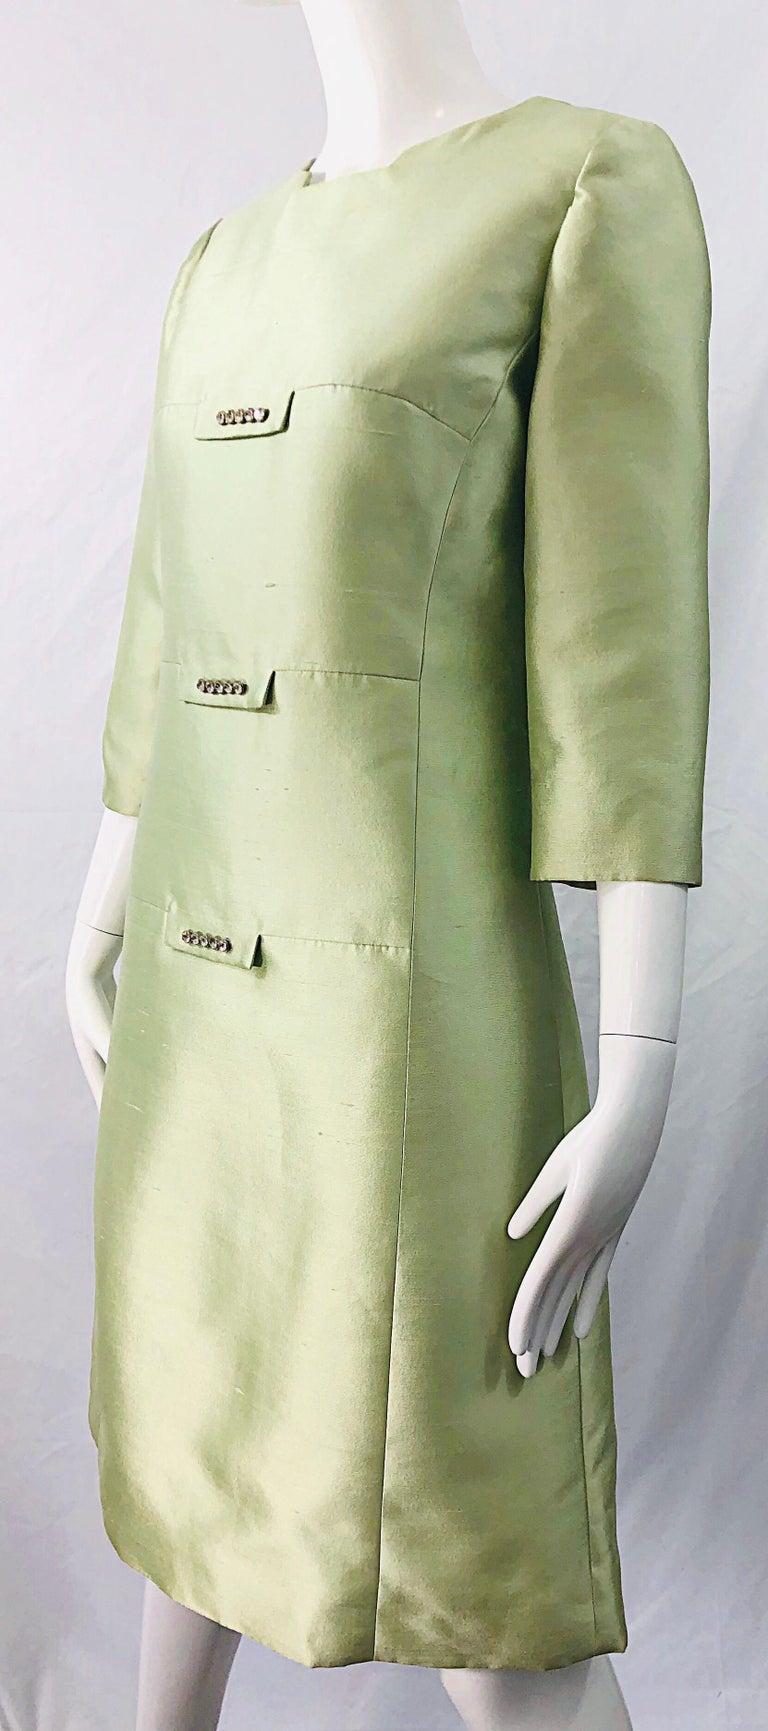 Chic 1960s Mint Green Silk Shantung Rhinestone Vintage 60s A Line Dress For Sale 7